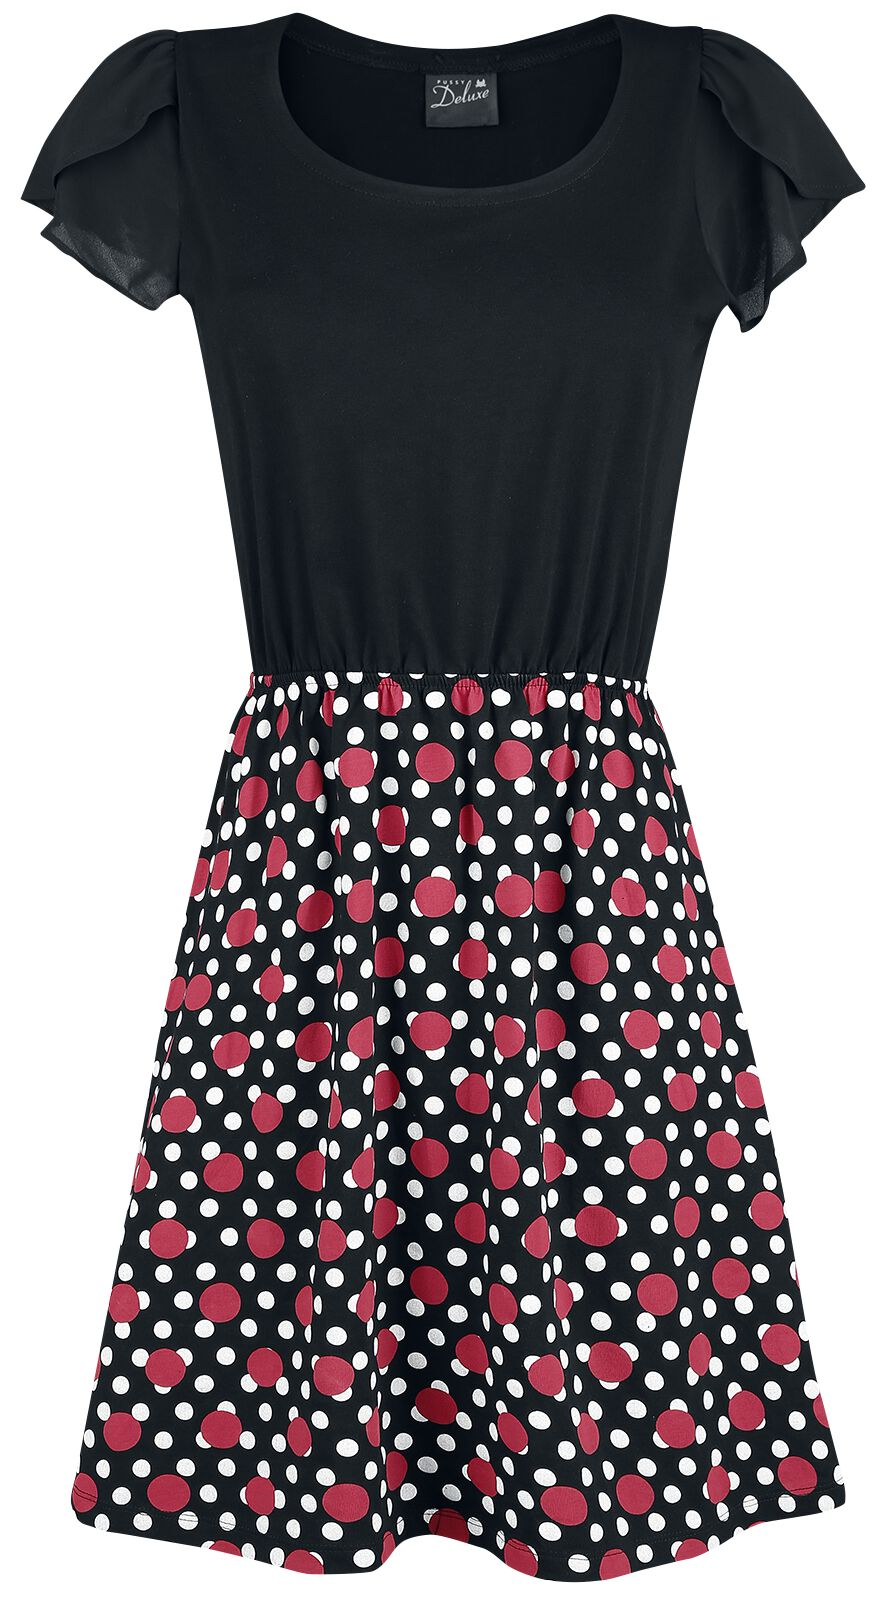 Image of   Pussy Deluxe Mixed Dotties Fantasy Dress Kjole sort-rød